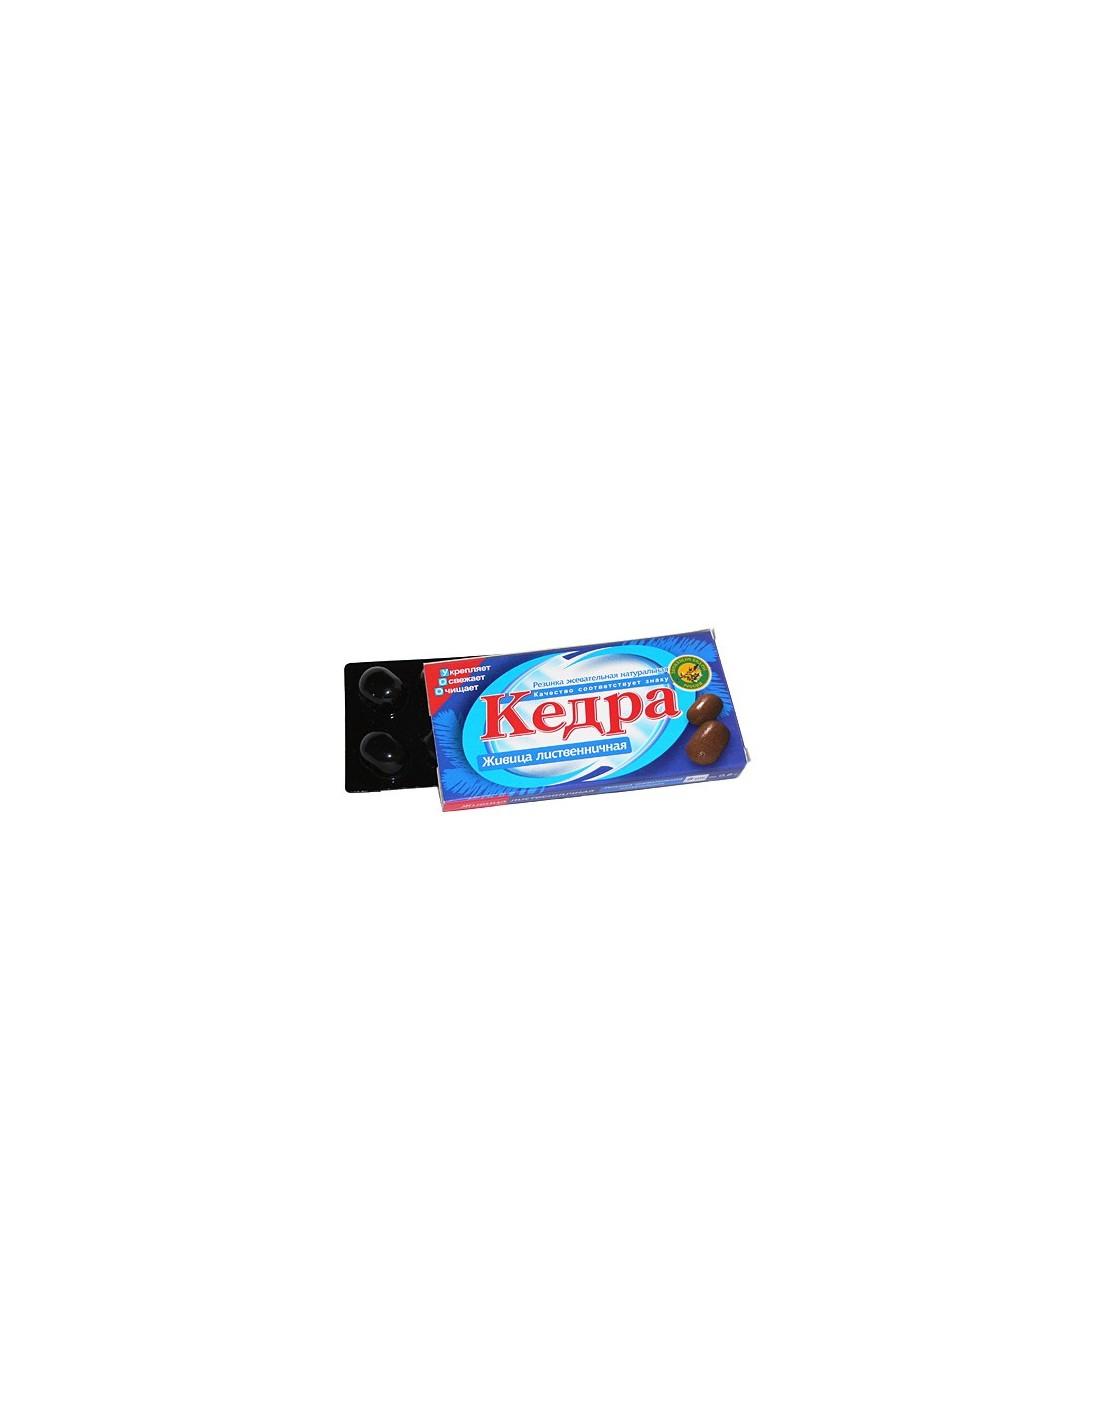 Kedra chewing gum larch resin 8 pcs